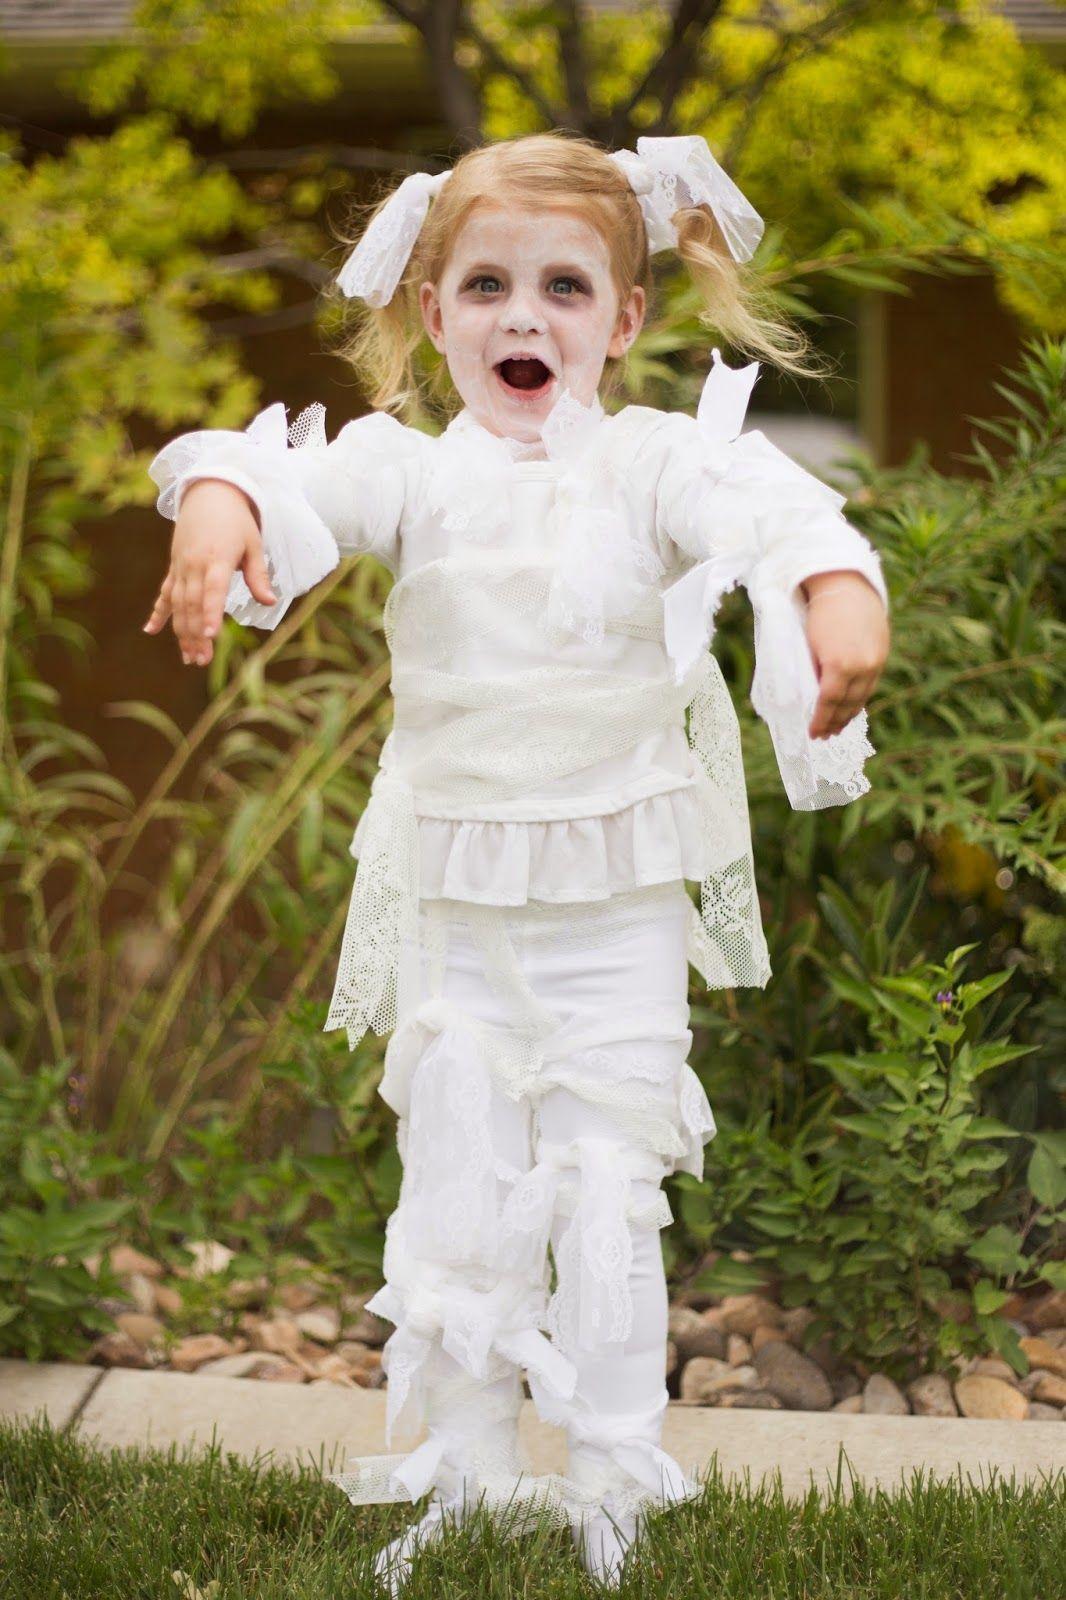 Do it yourself divas diy costumes pinterest do it yourself divas diy little girl lace mummy halloween costume halloween costume ideas for kids halloween dress up little girl solutioingenieria Choice Image